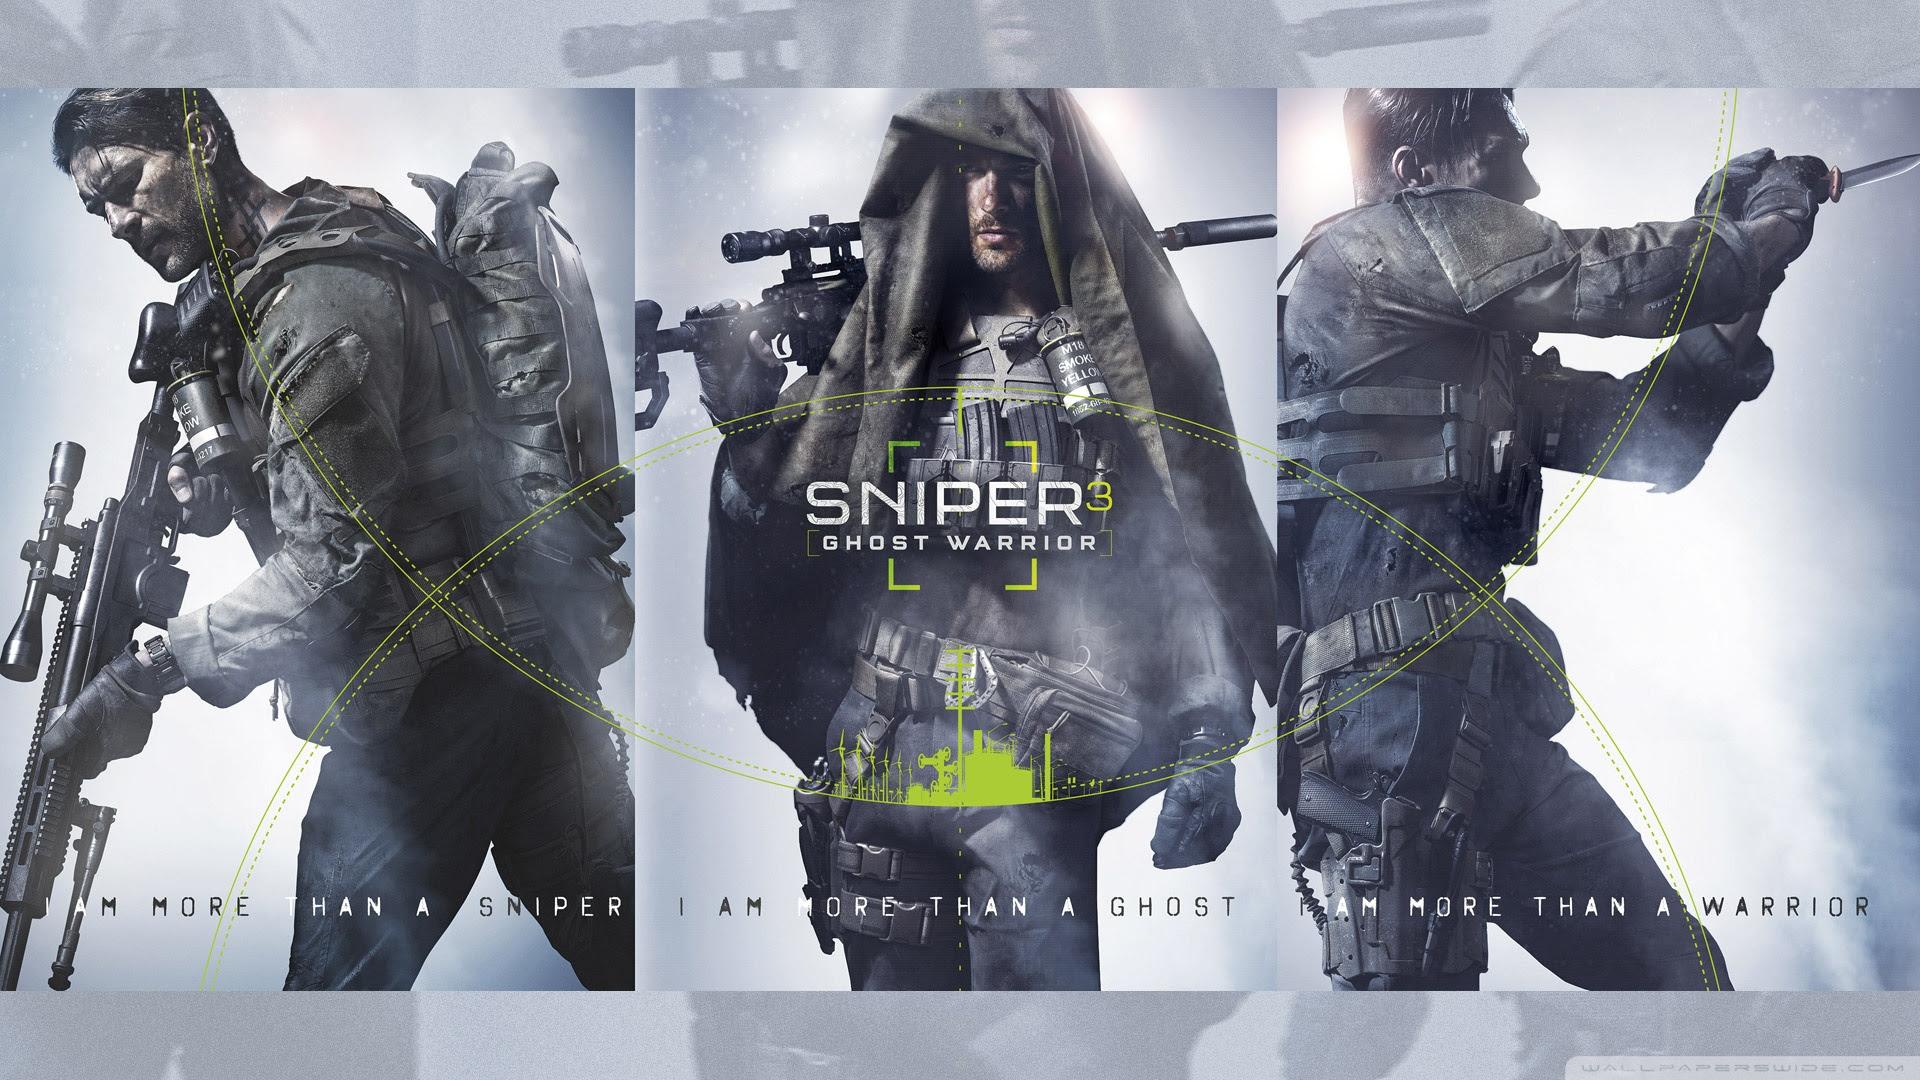 Sniper Ghost Warrior 3 Ultra Hd Desktop Background Wallpaper For